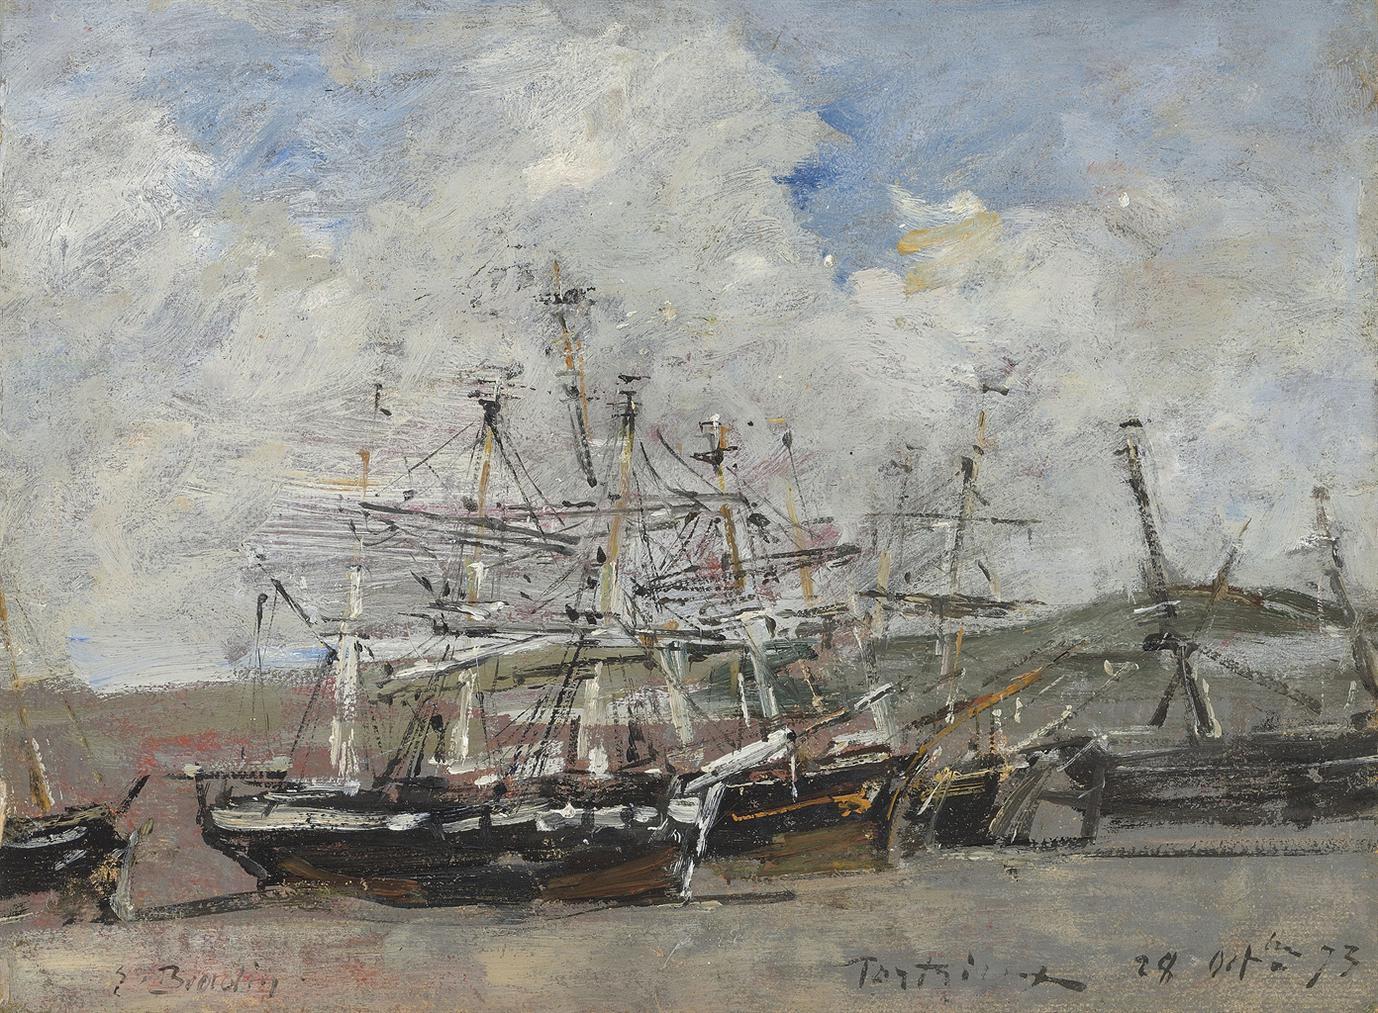 Eugene Louis Boudin-Portrieux. Le Port A Maree Basse-1973